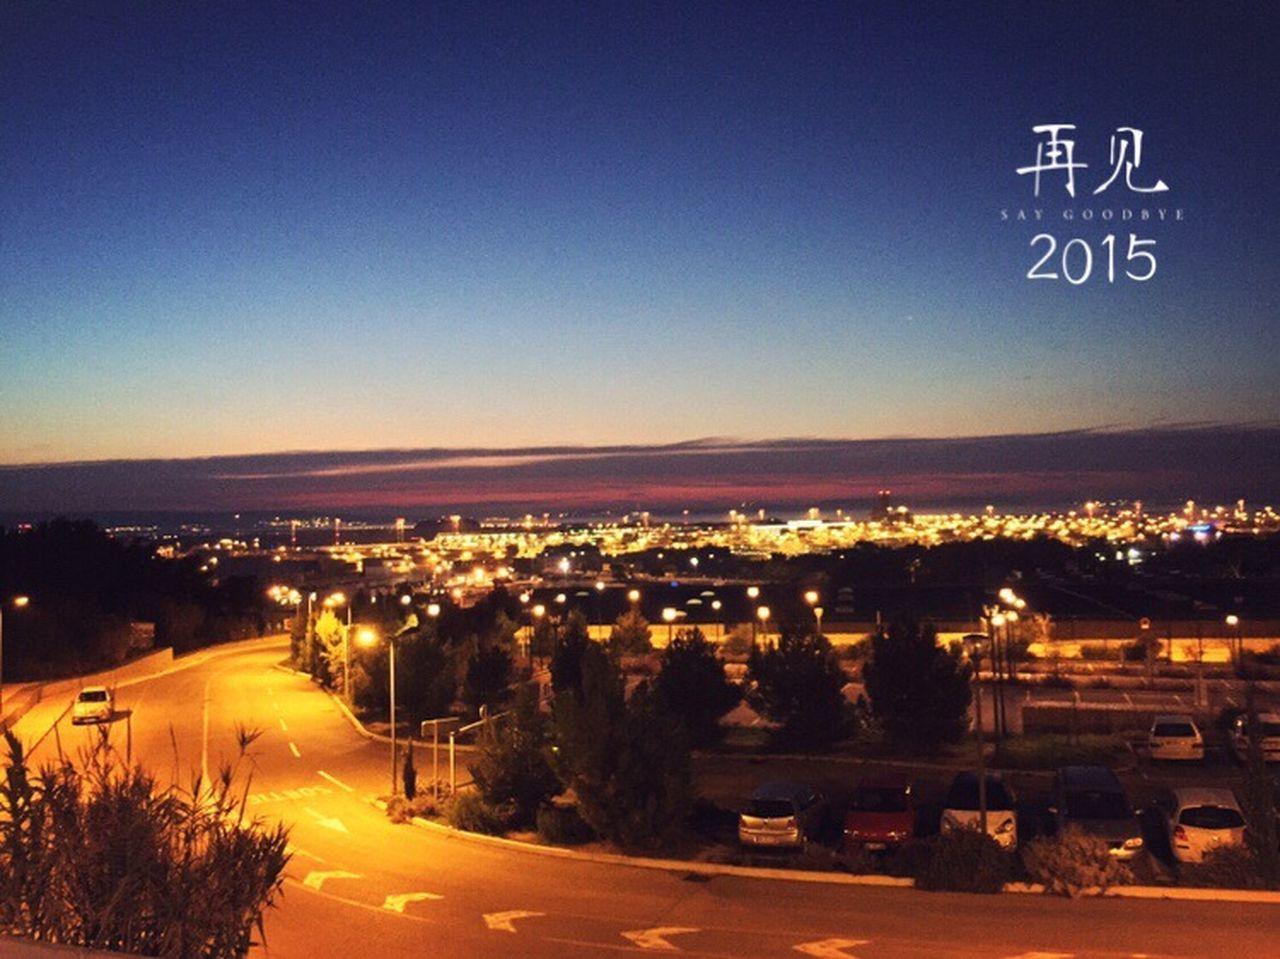 illuminated, transportation, road, outdoors, car, no people, night, blue, tree, clear sky, city, nature, sky